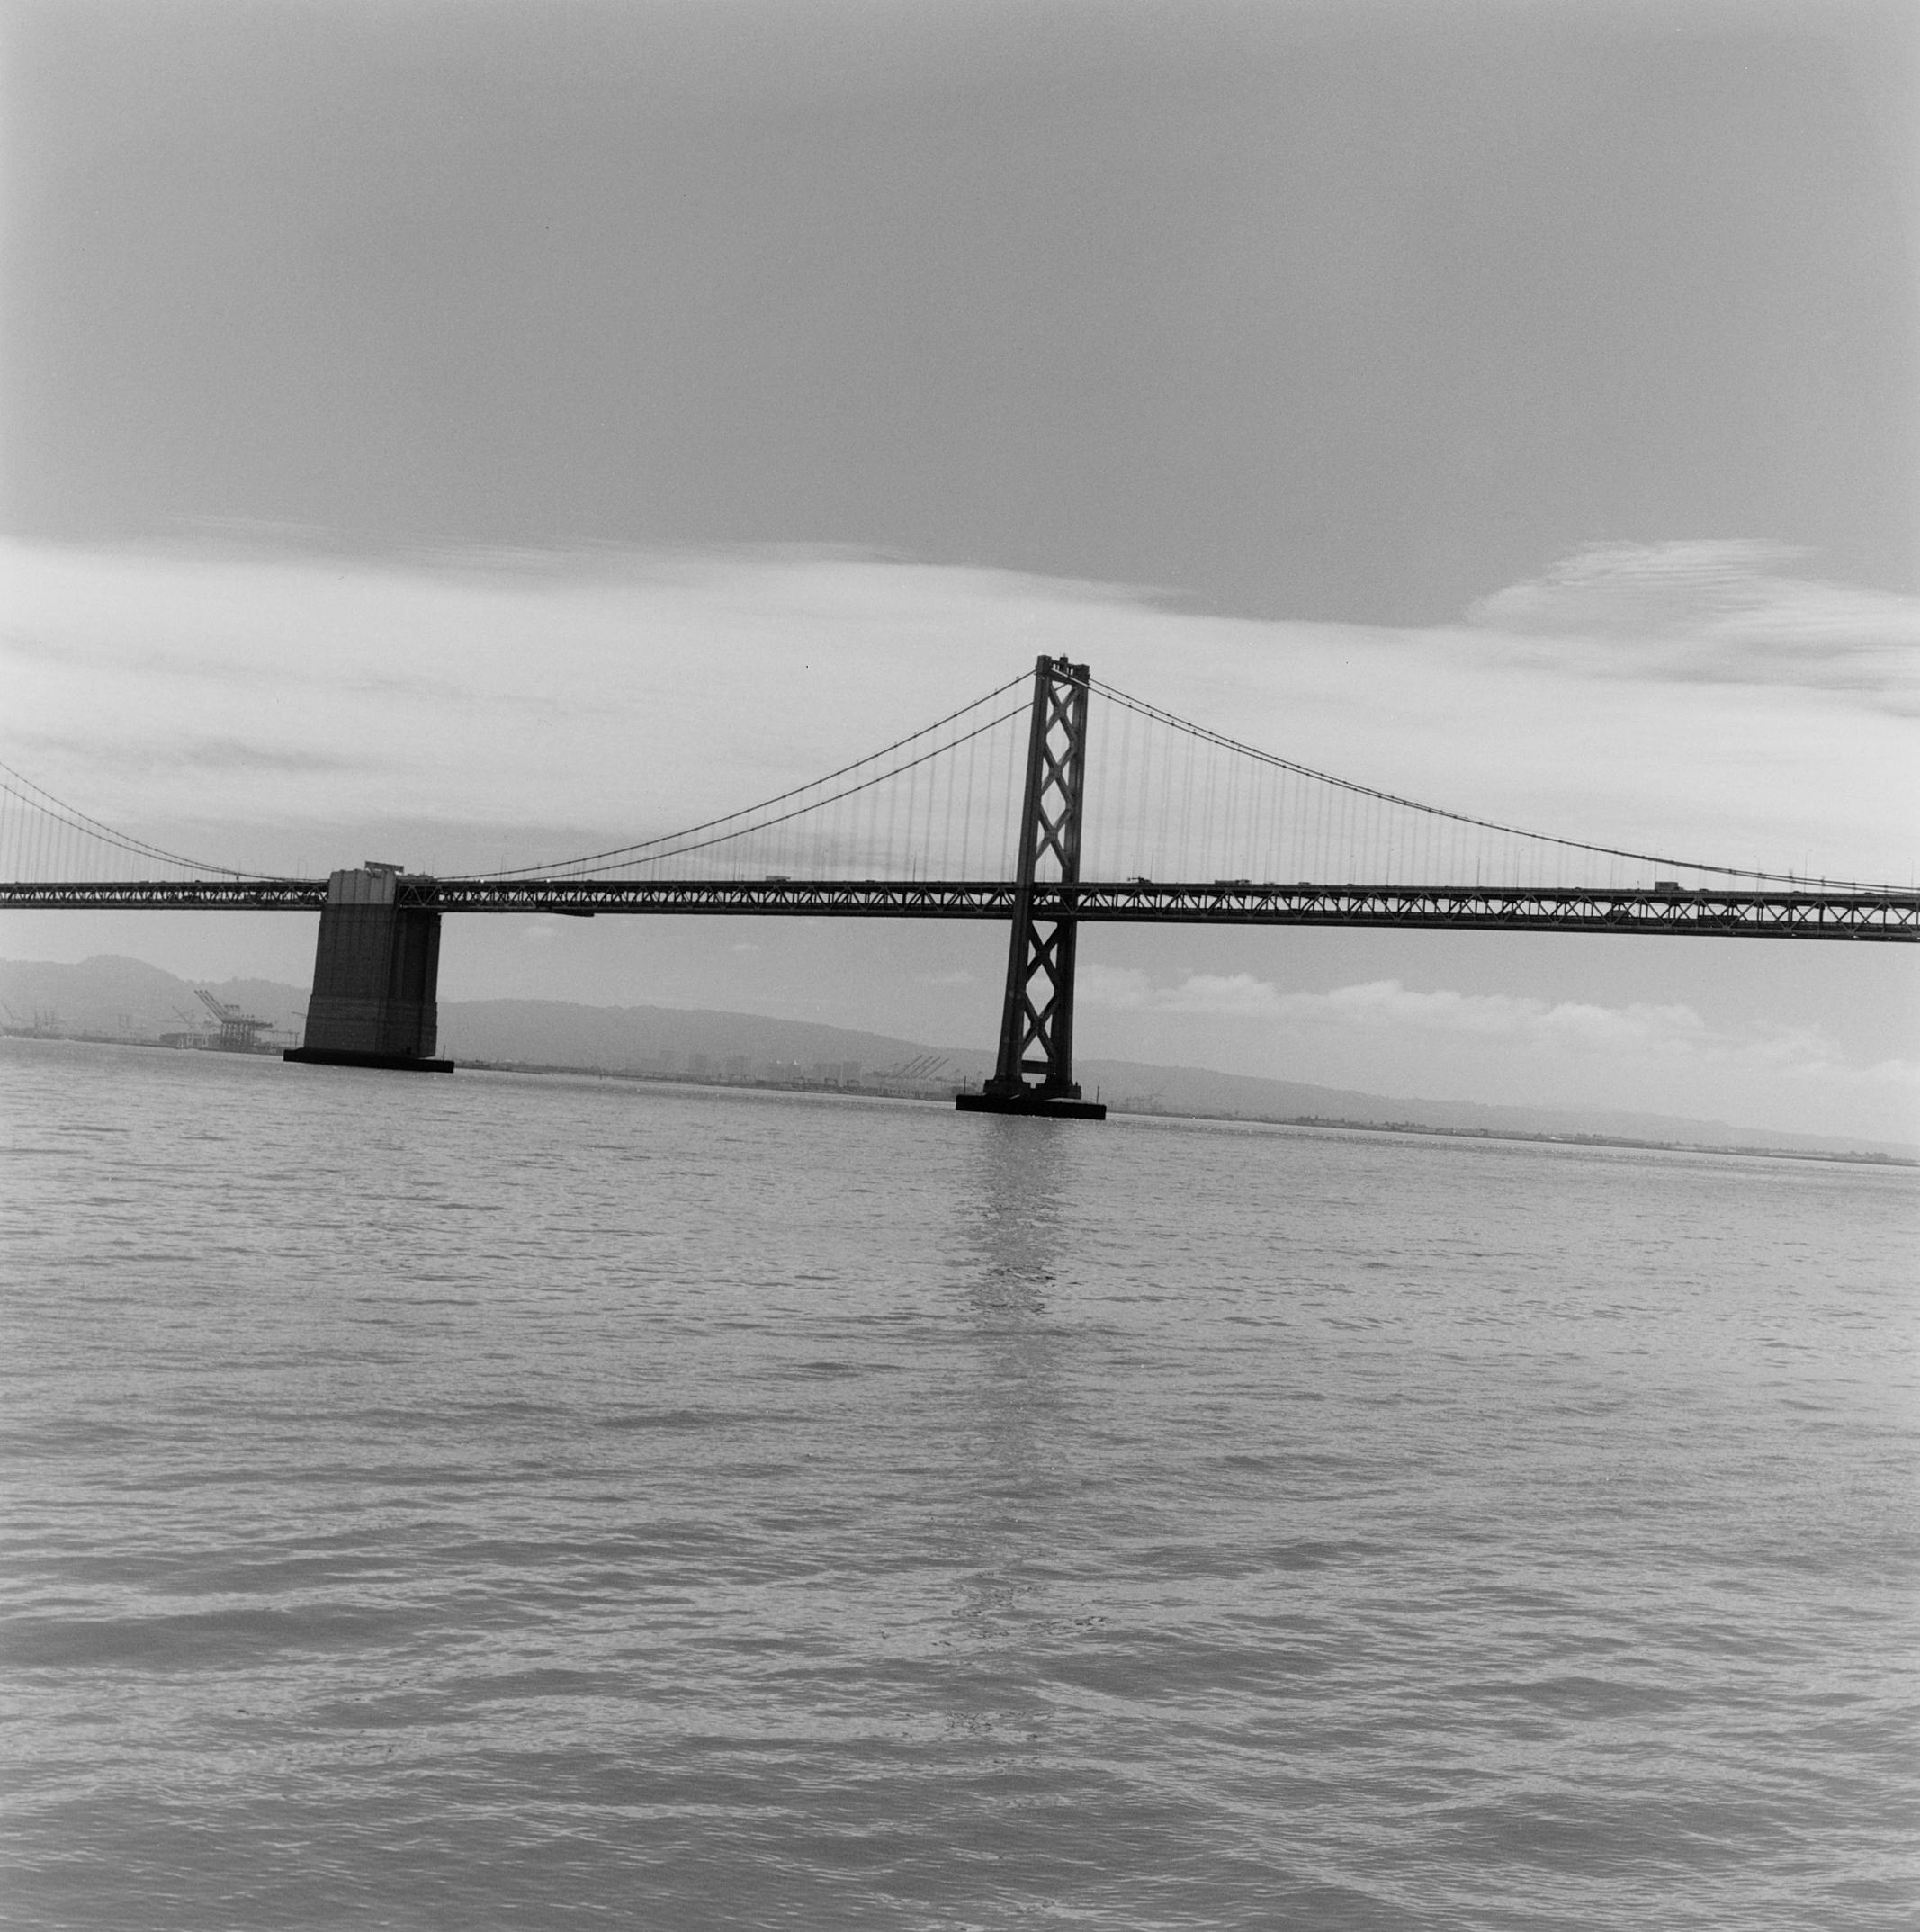 Harbor Bay Bridge, San Francisco, California, 2014